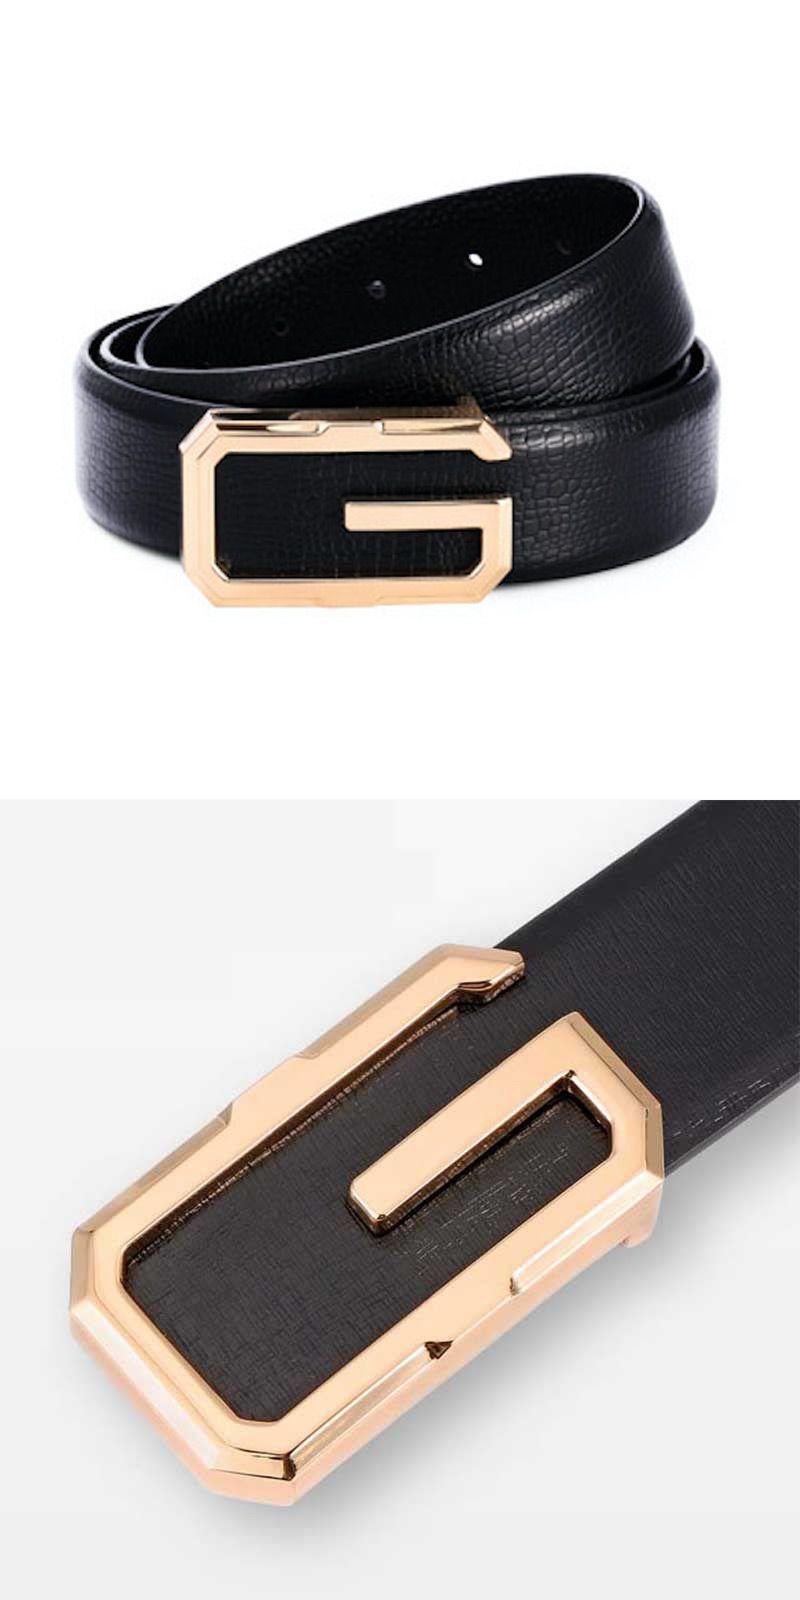 Adjustable Fashionable Canvas Metal Square Ring Buckle Canvas Belt Y